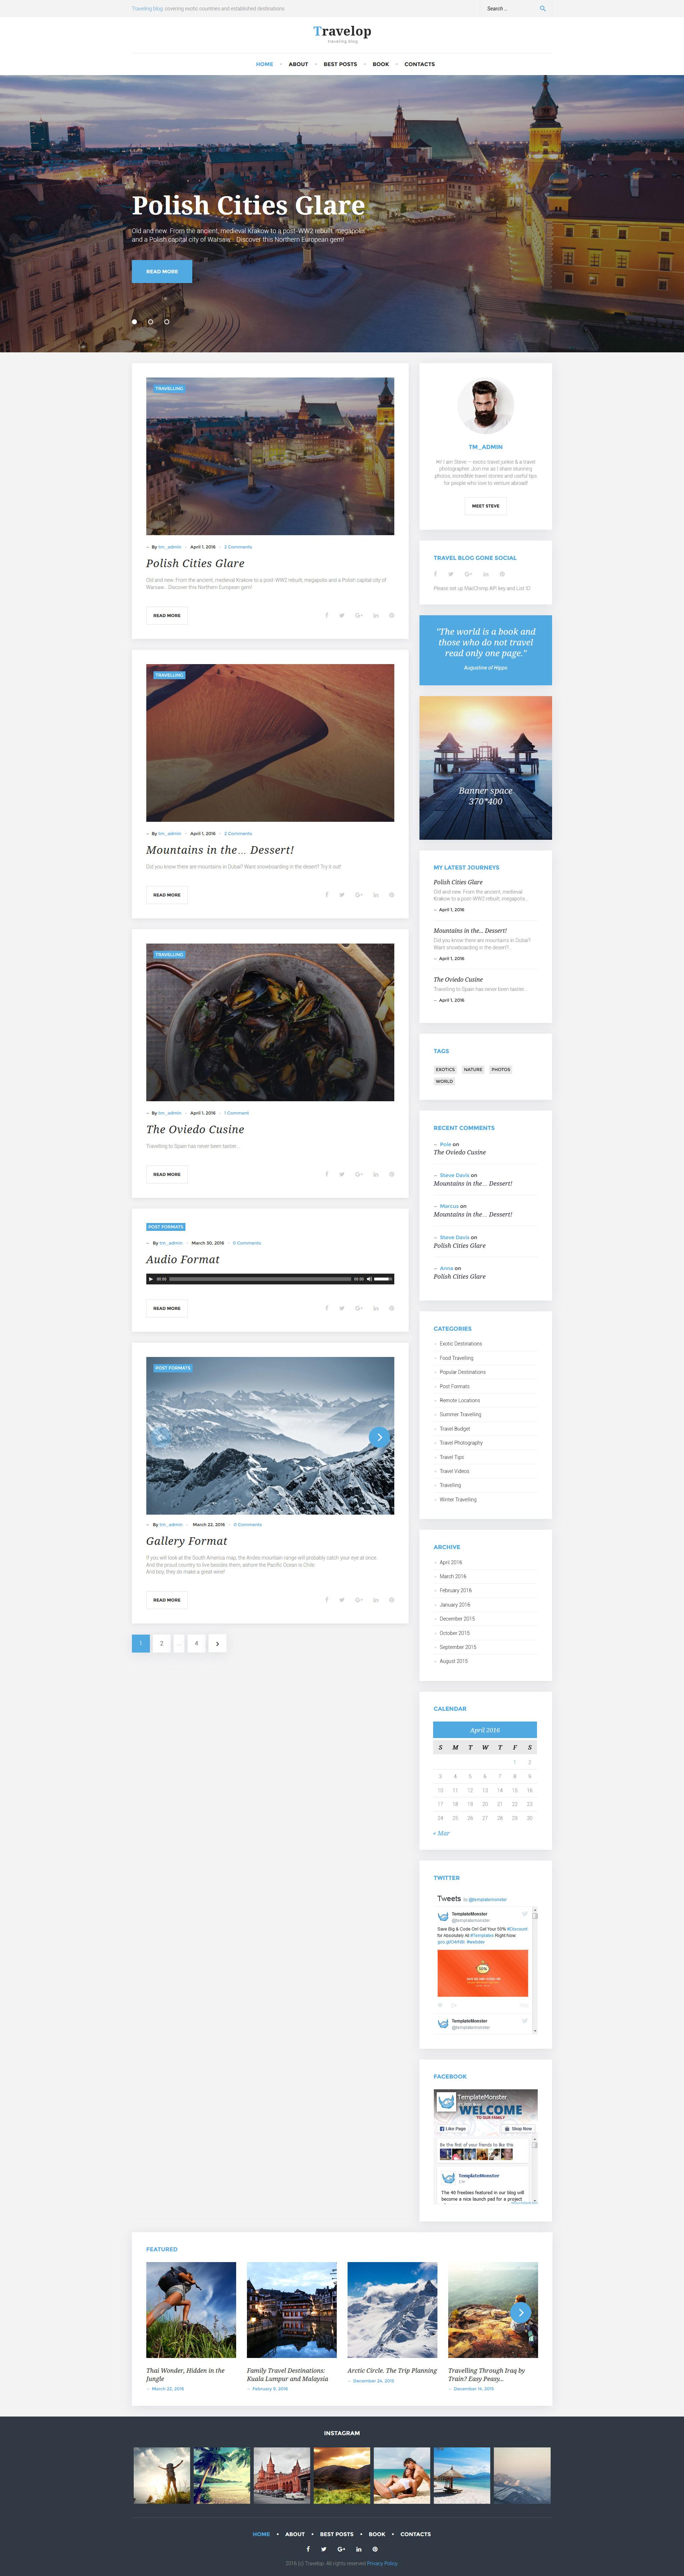 """Travelop - Traveling Blog"" - адаптивний WordPress шаблон №58534 - скріншот"